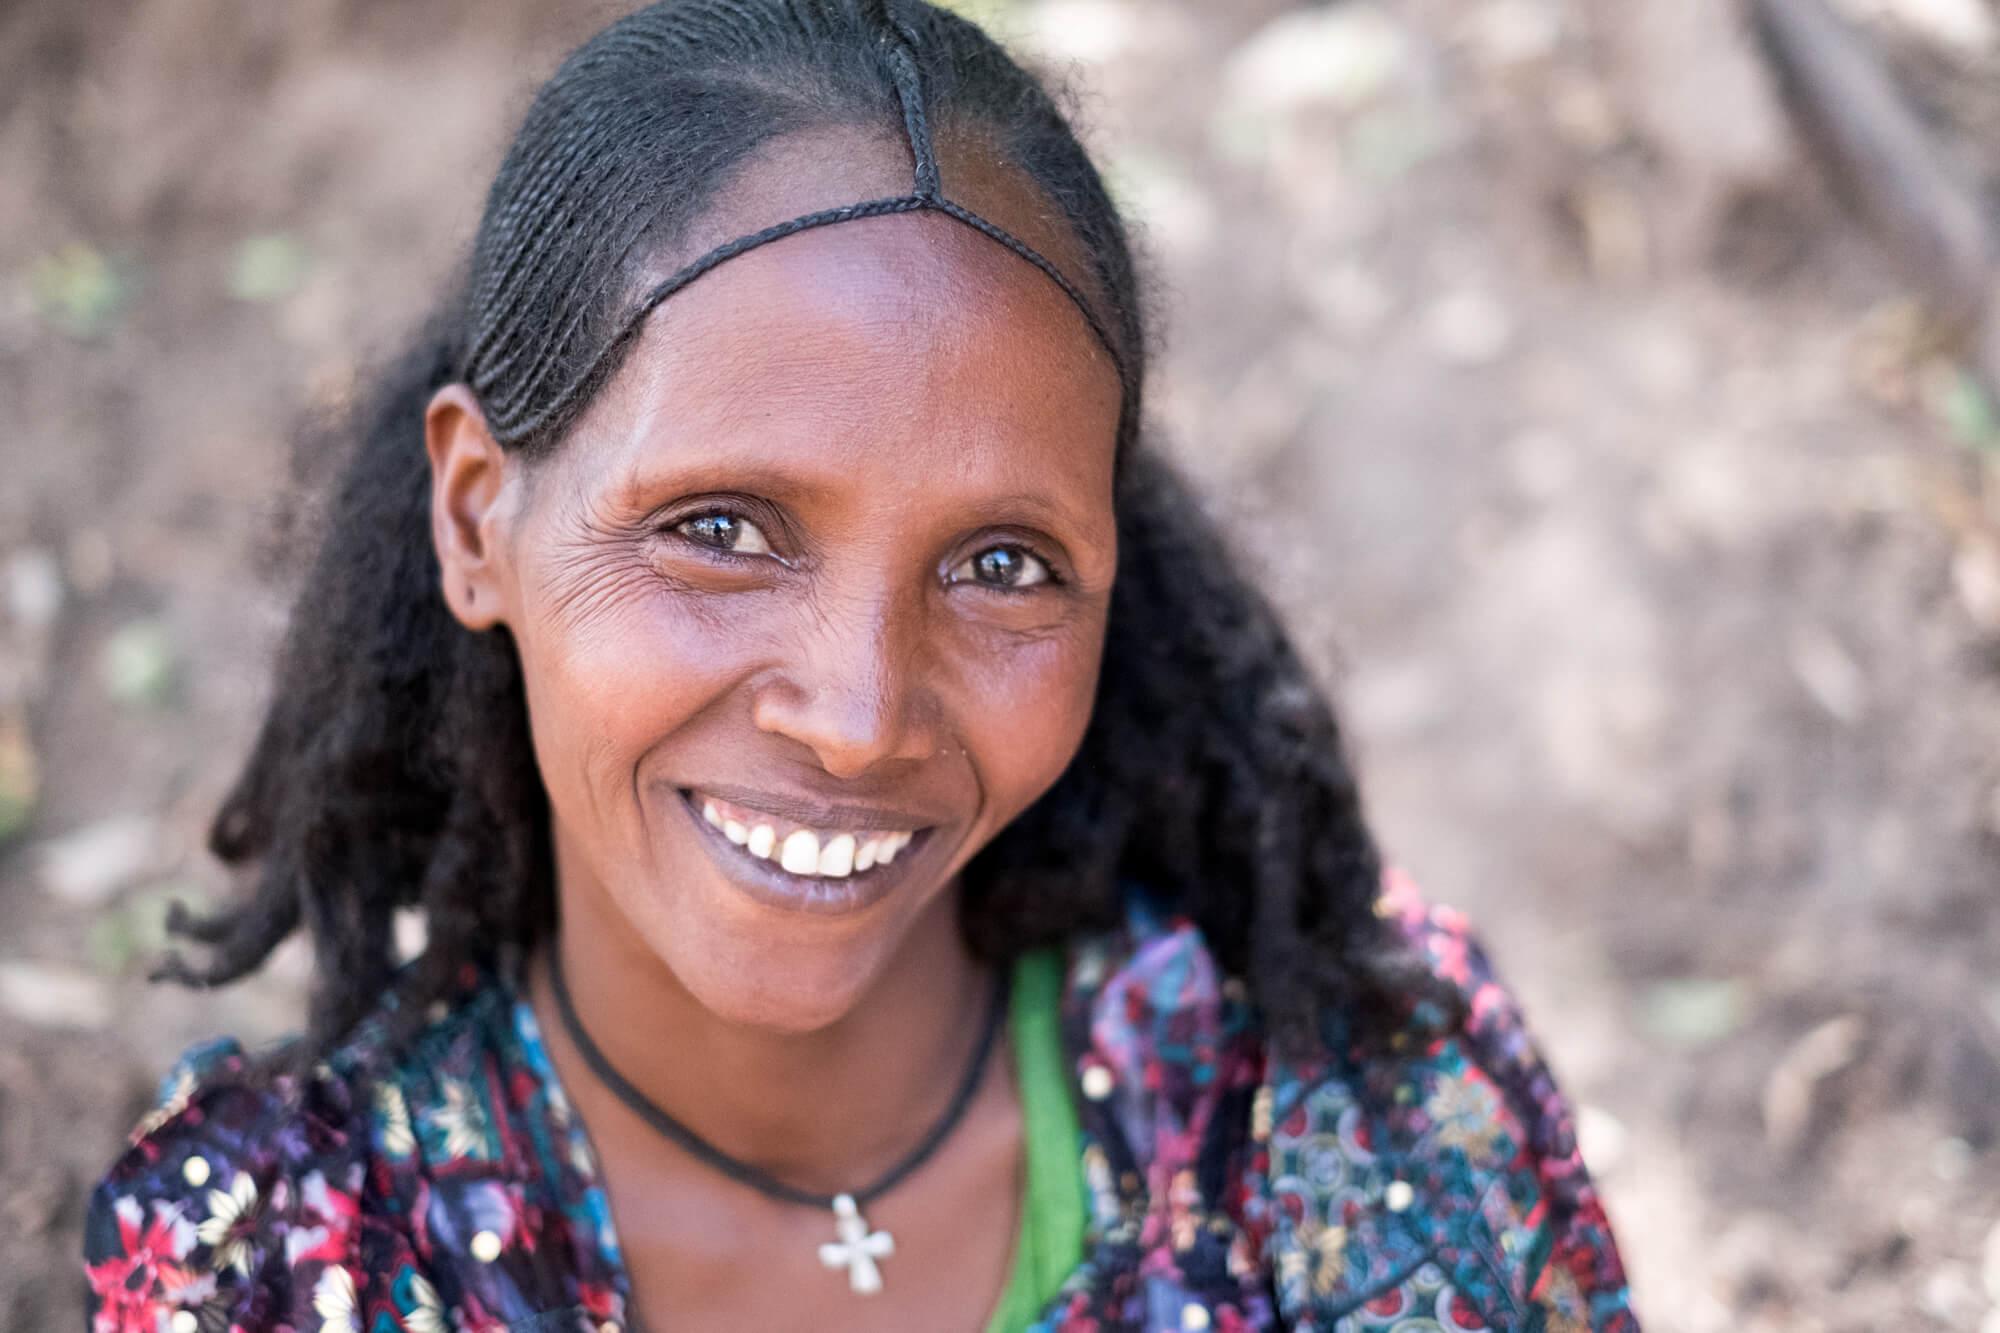 Caritas International België Het verhaal van Mihret